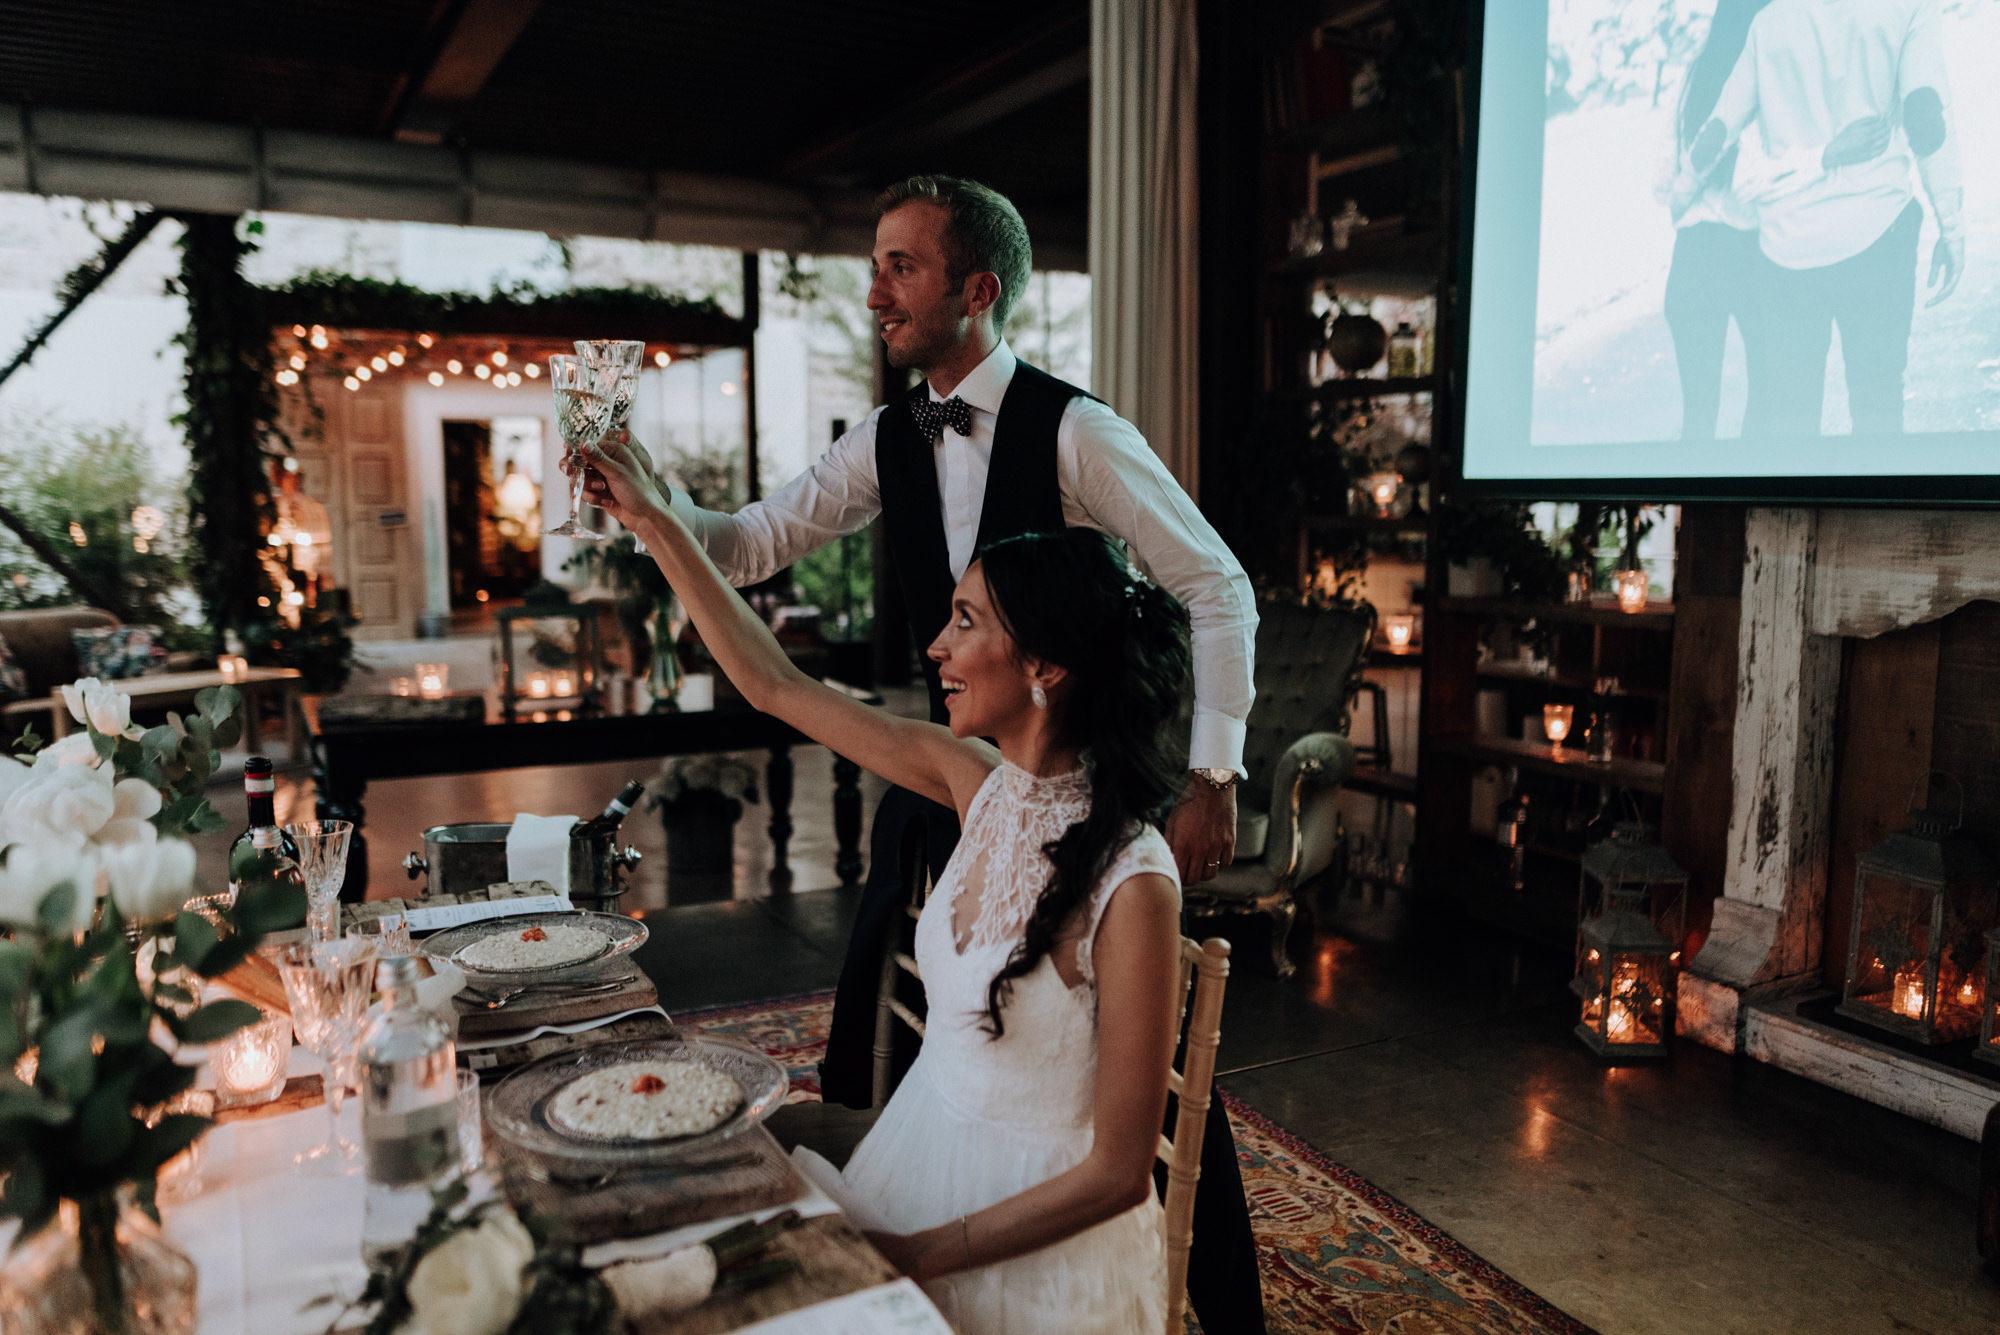 FOTO+PHOTO+BODA+WEDDING+ITALIA+ITALY+MAURICIO+GARAY+MAURICIOGARAY+WEDDINPHOTOGRAPHER+FOTOGRAFODEBODA-1699.jpg